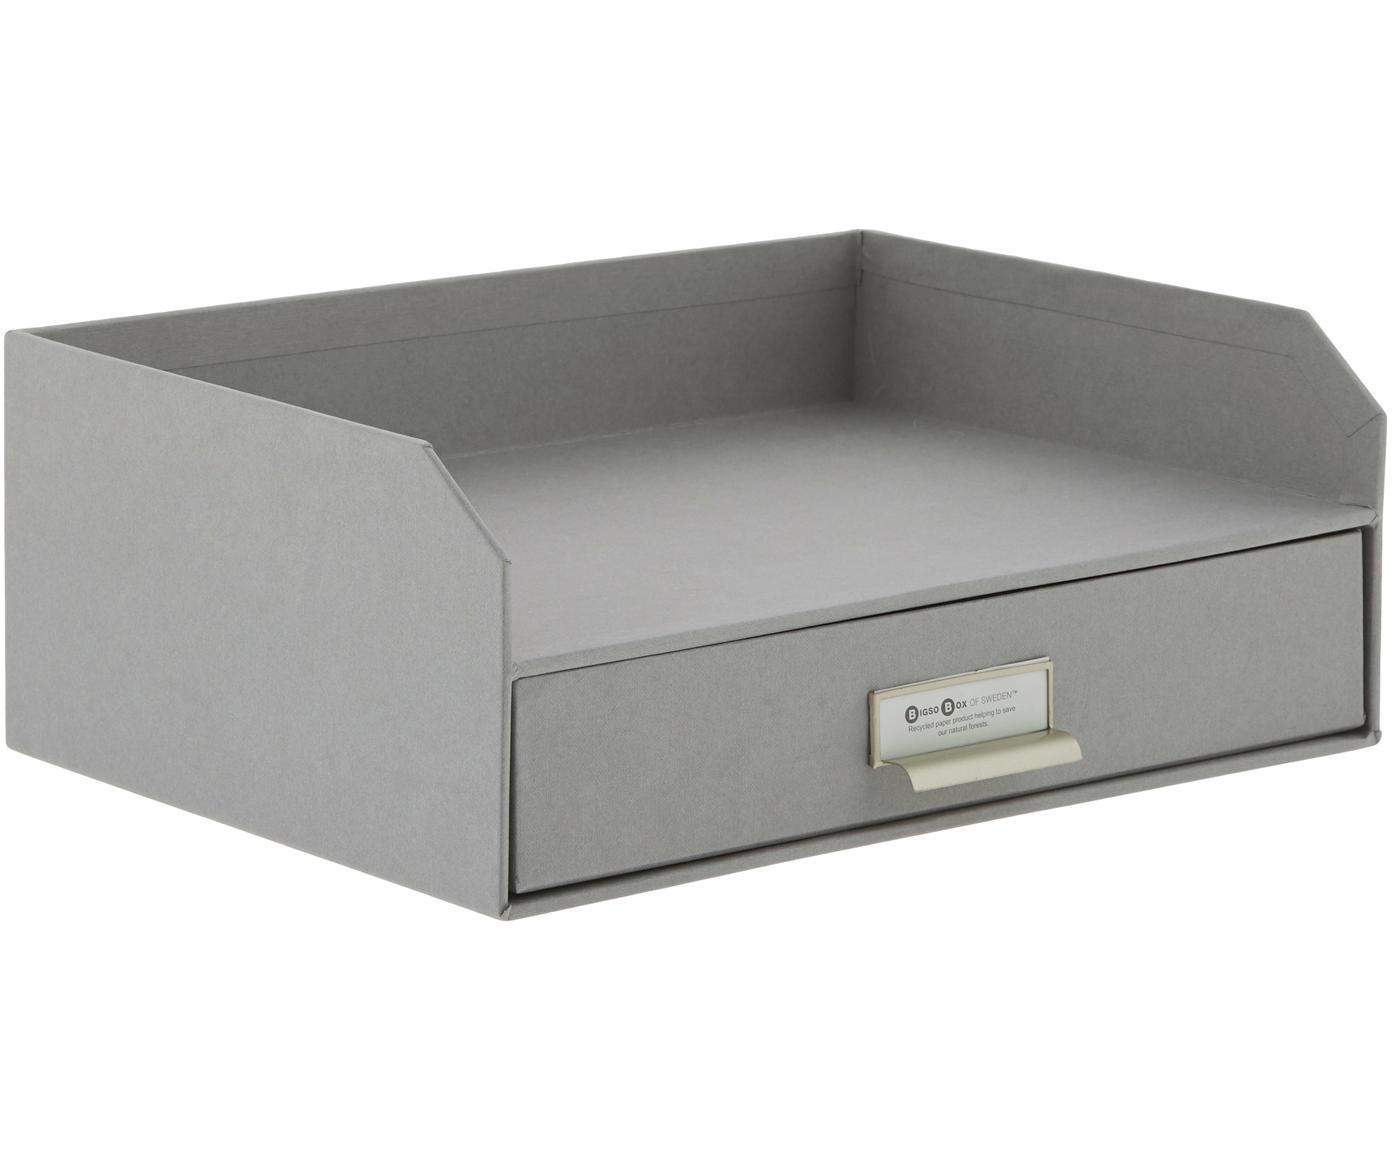 Büro-Organizer Walter, Organizer: Fester, laminierter Karto, Grau, 33 x 13 cm